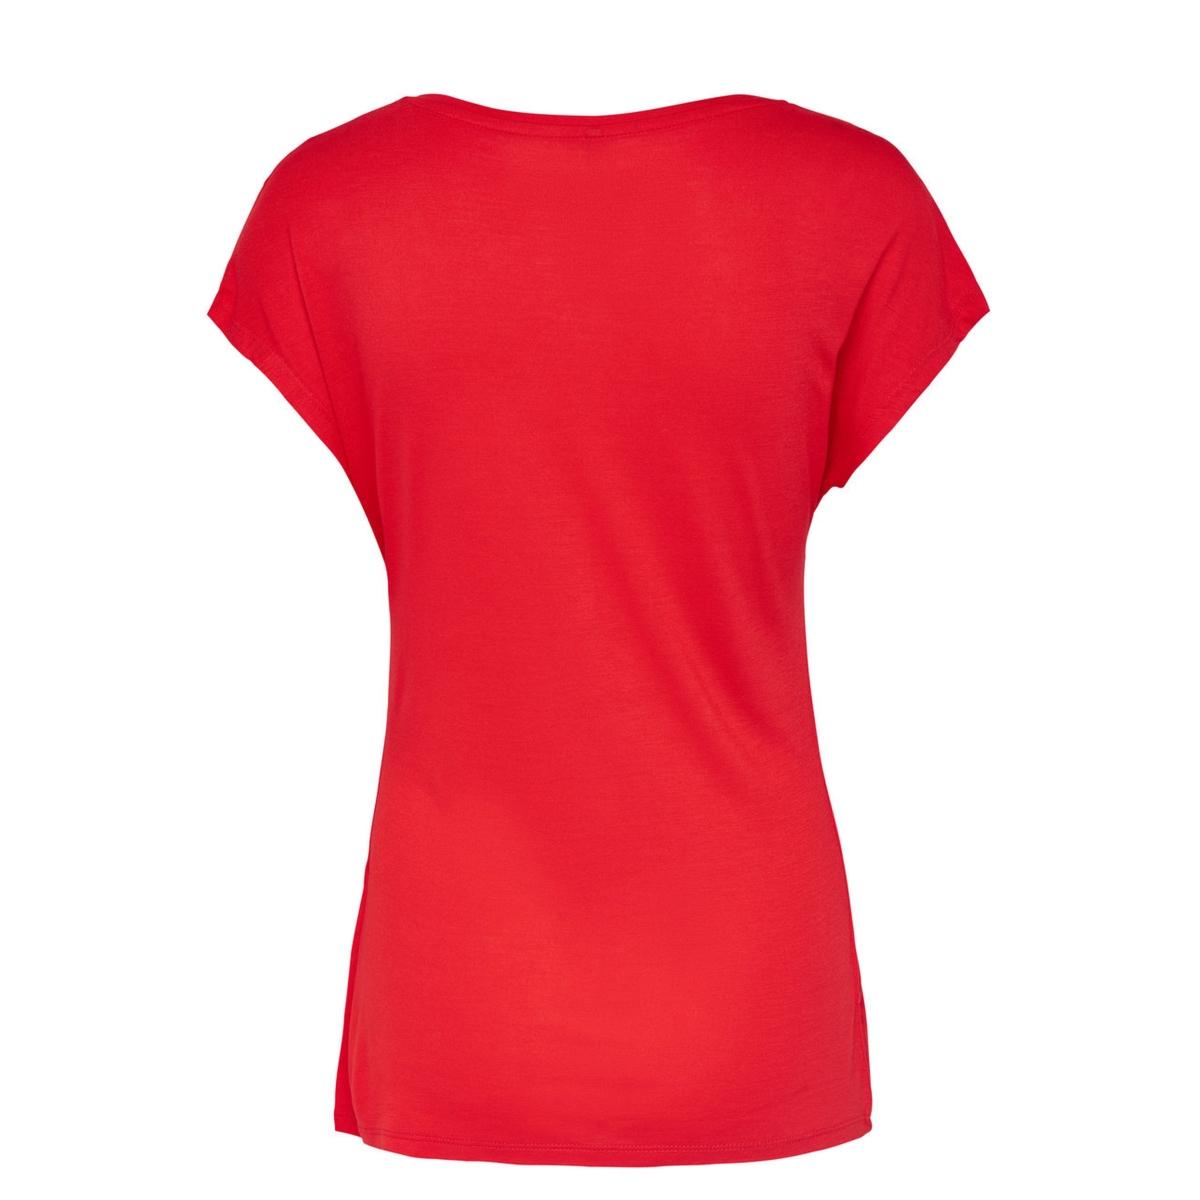 onlviscose s/s fav print top box es 15149797 only t-shirt flame scarlet/tomboy